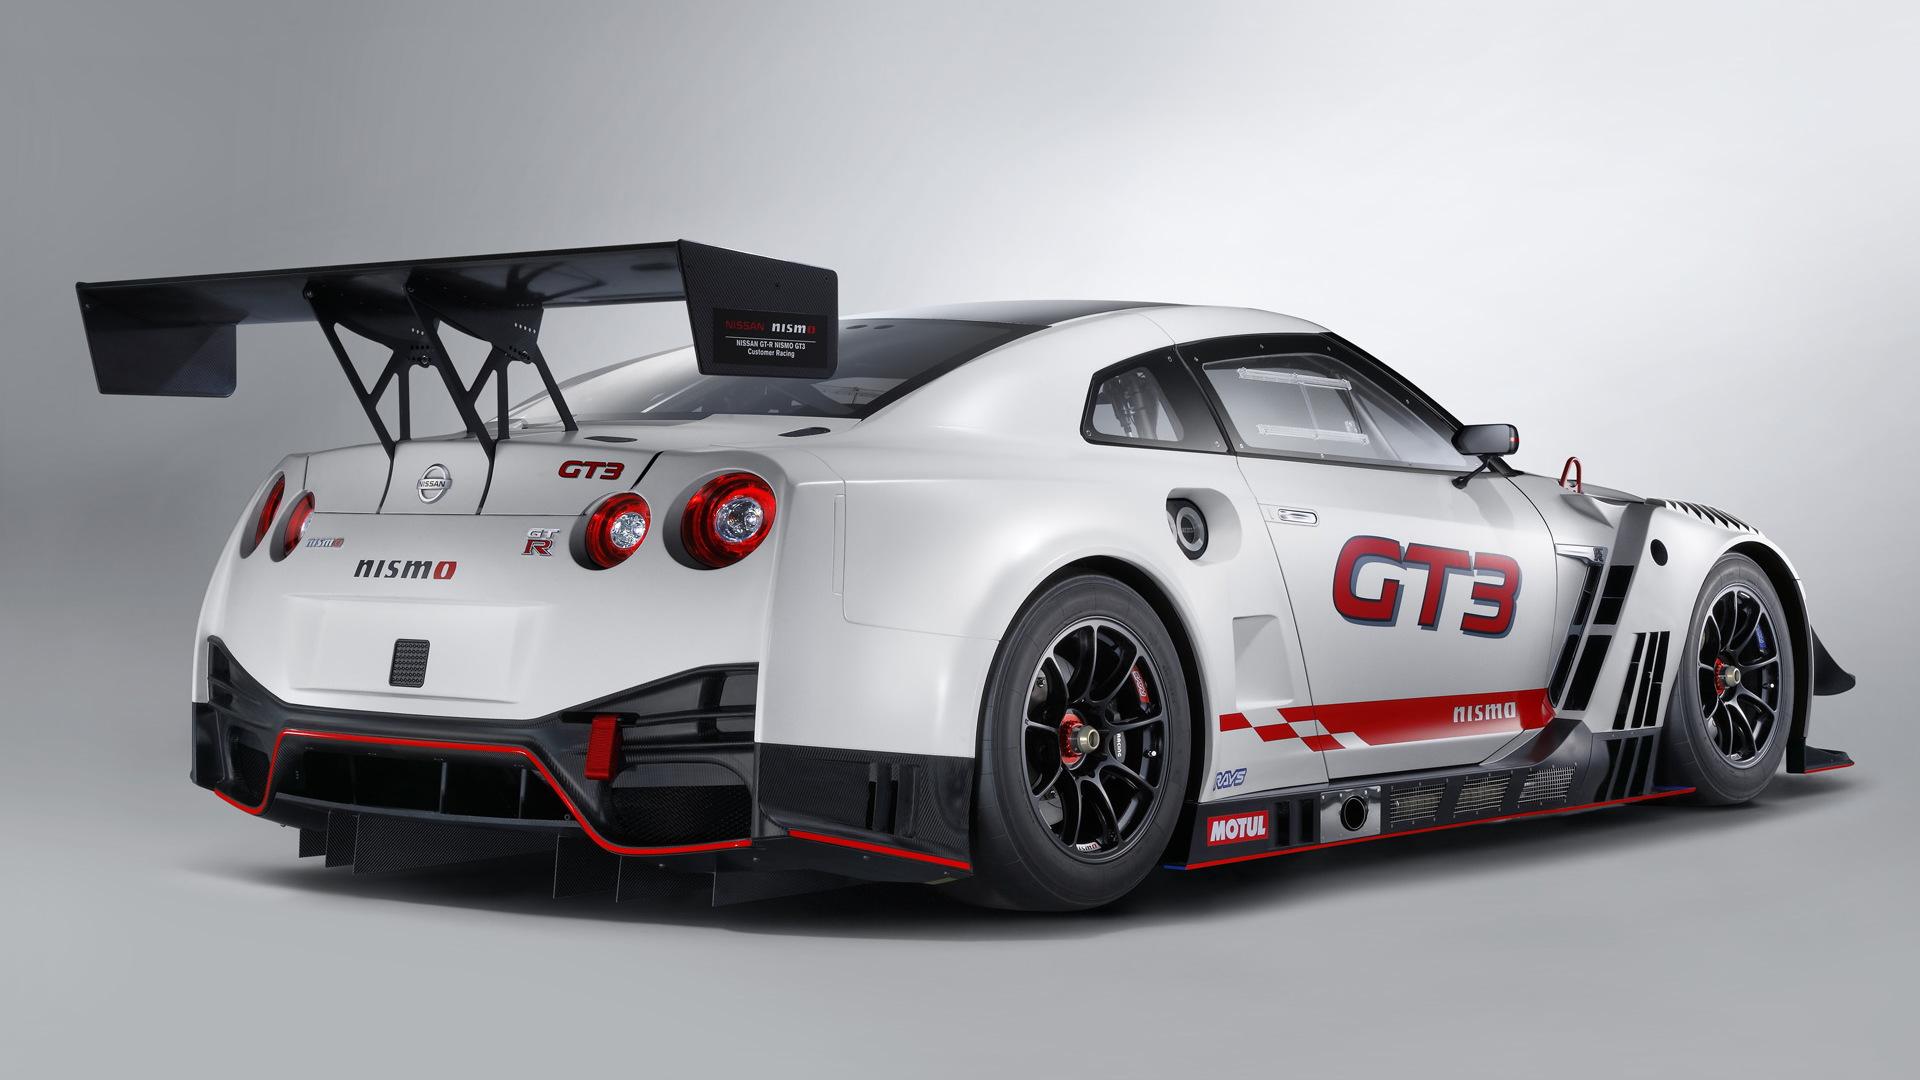 2019 Nissan GT-R Nismo GT3